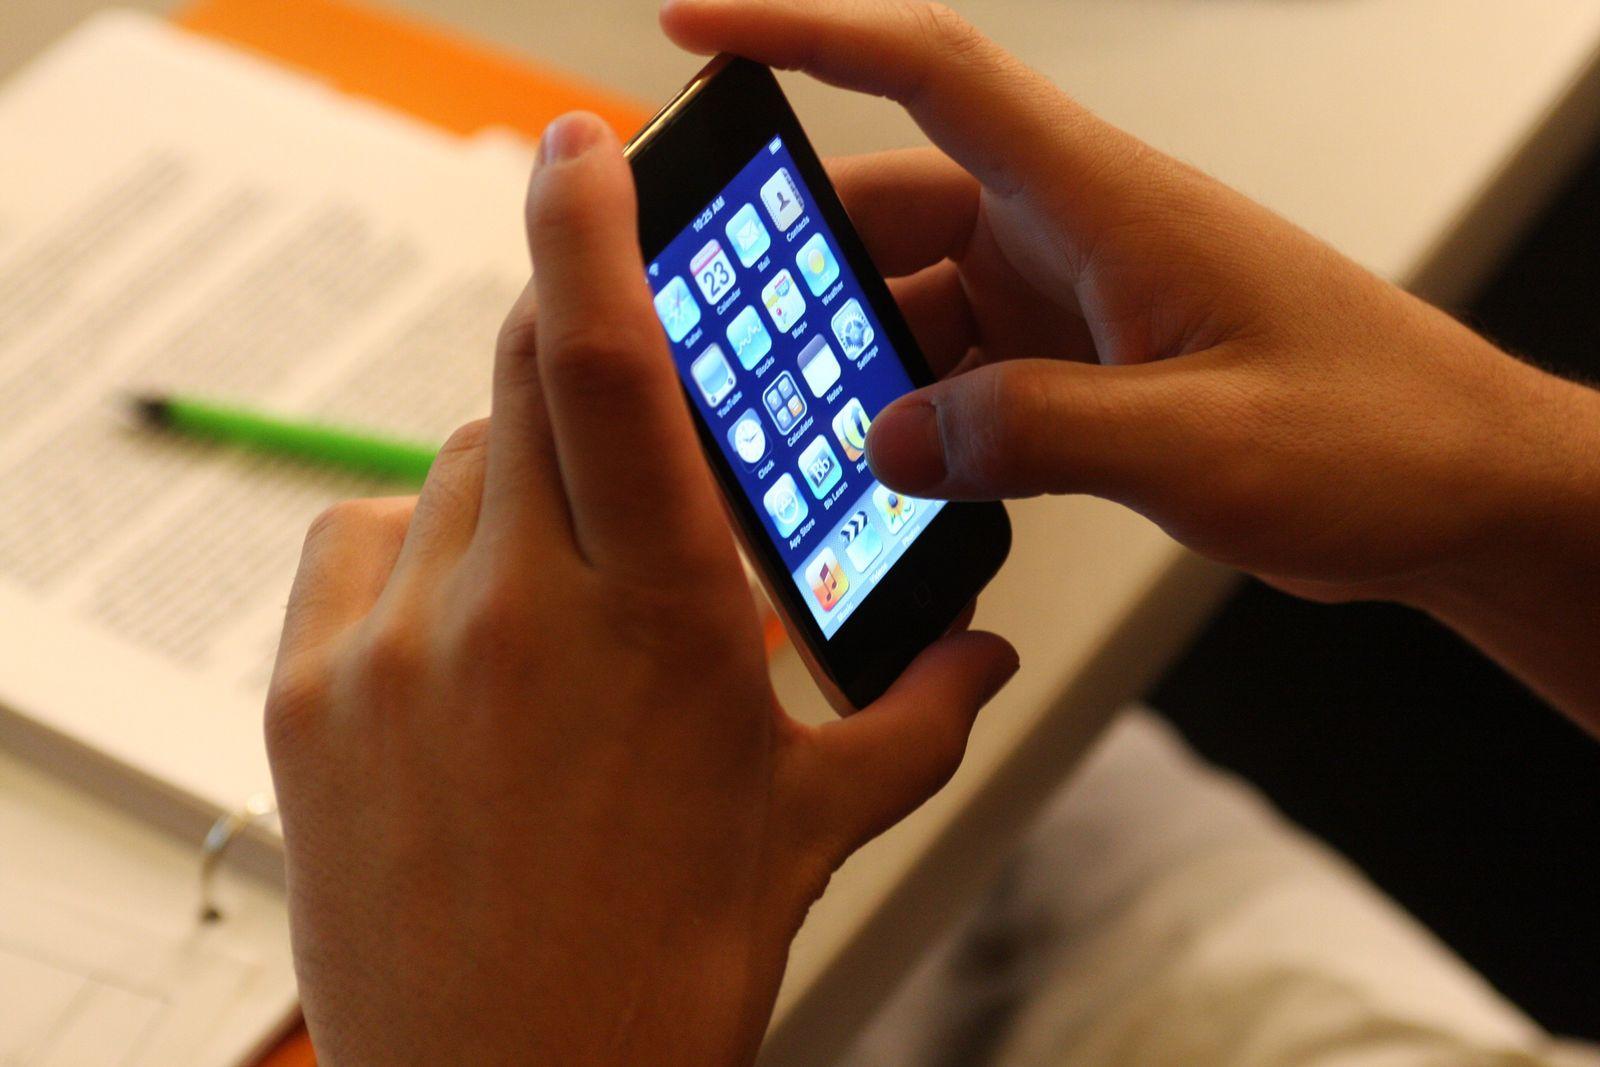 Touchscreen / iPhone